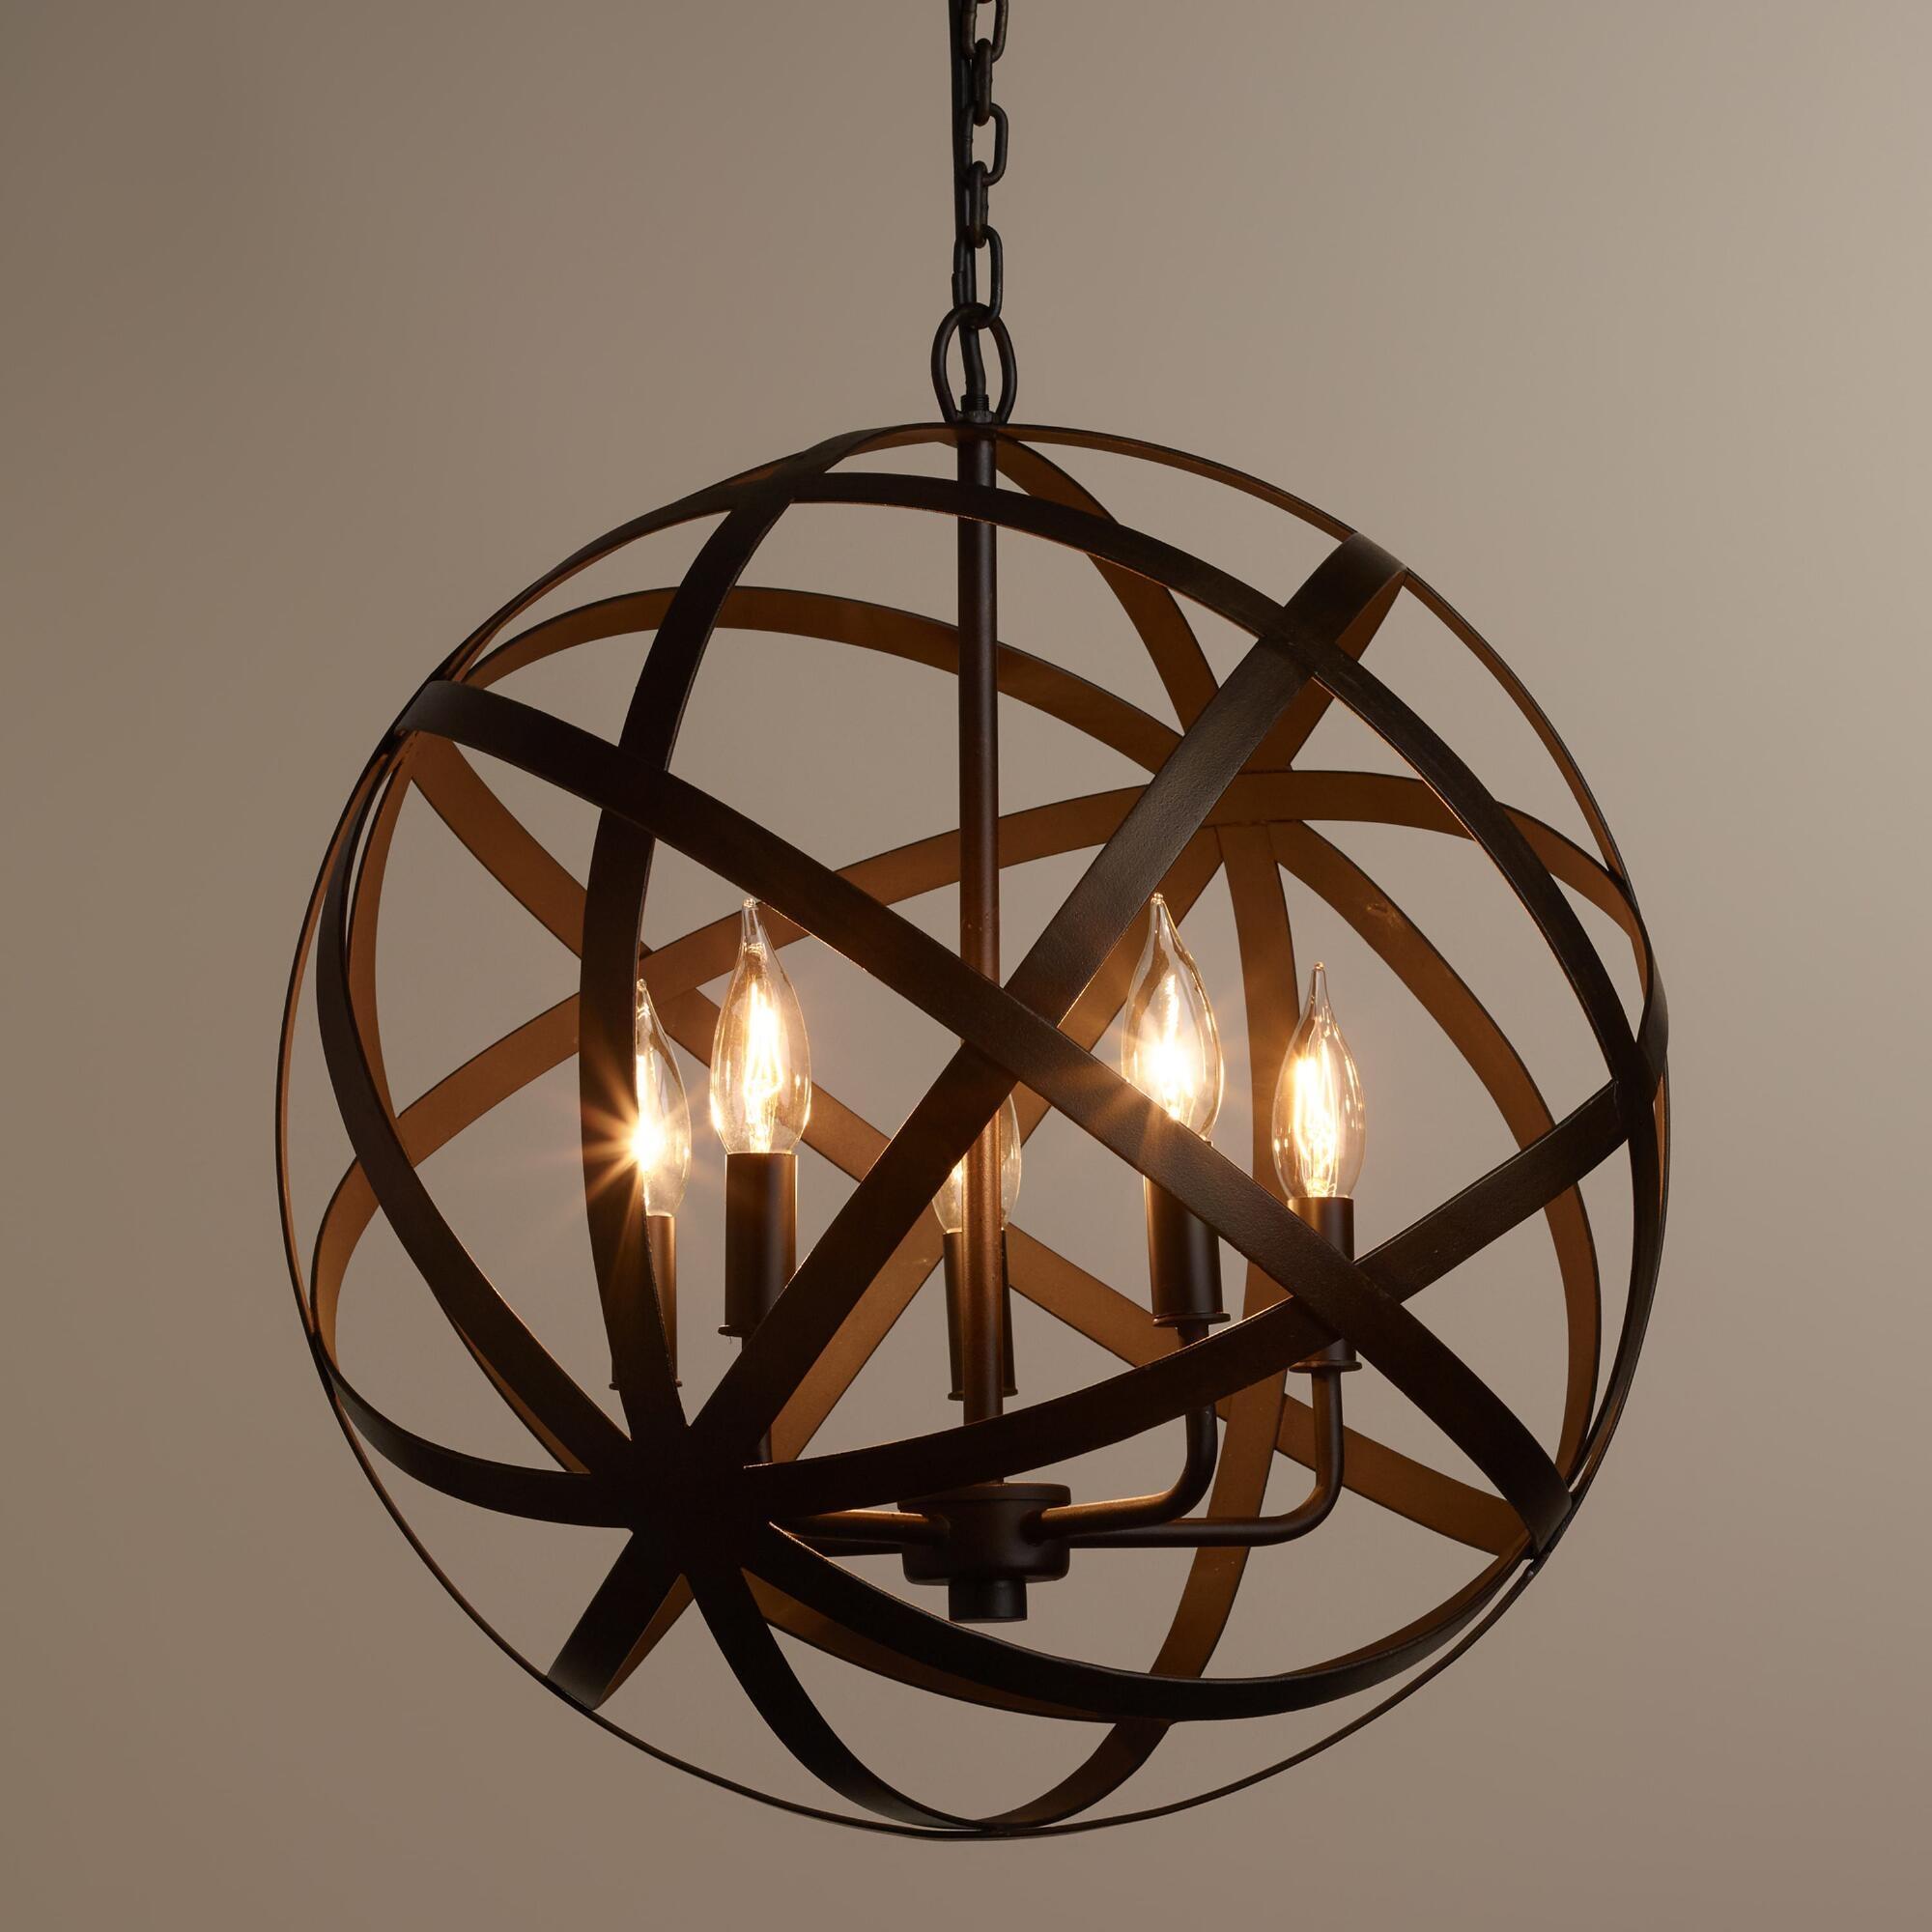 12 Best Ideas Of Metal Sphere Chandelier